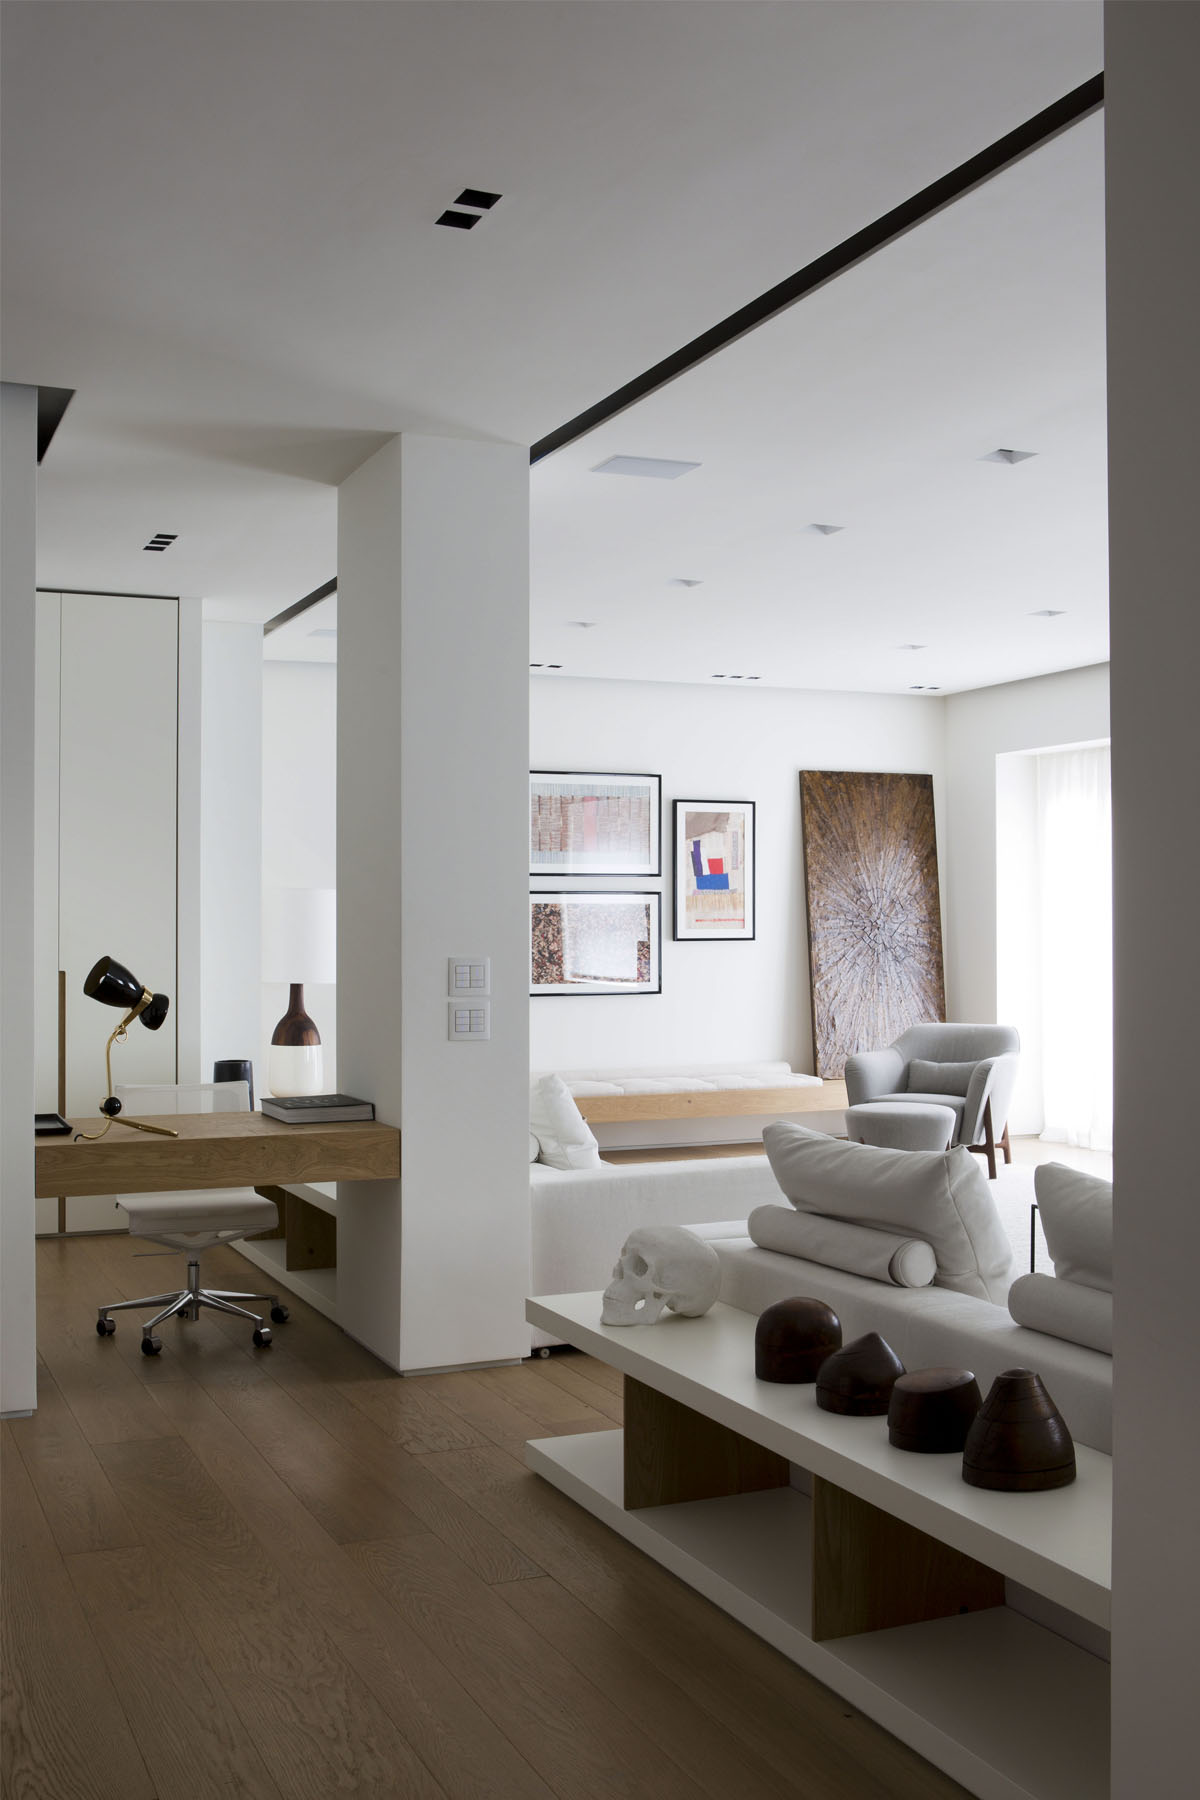 10 bonucci Sleek Modern by Fabio Fantolino